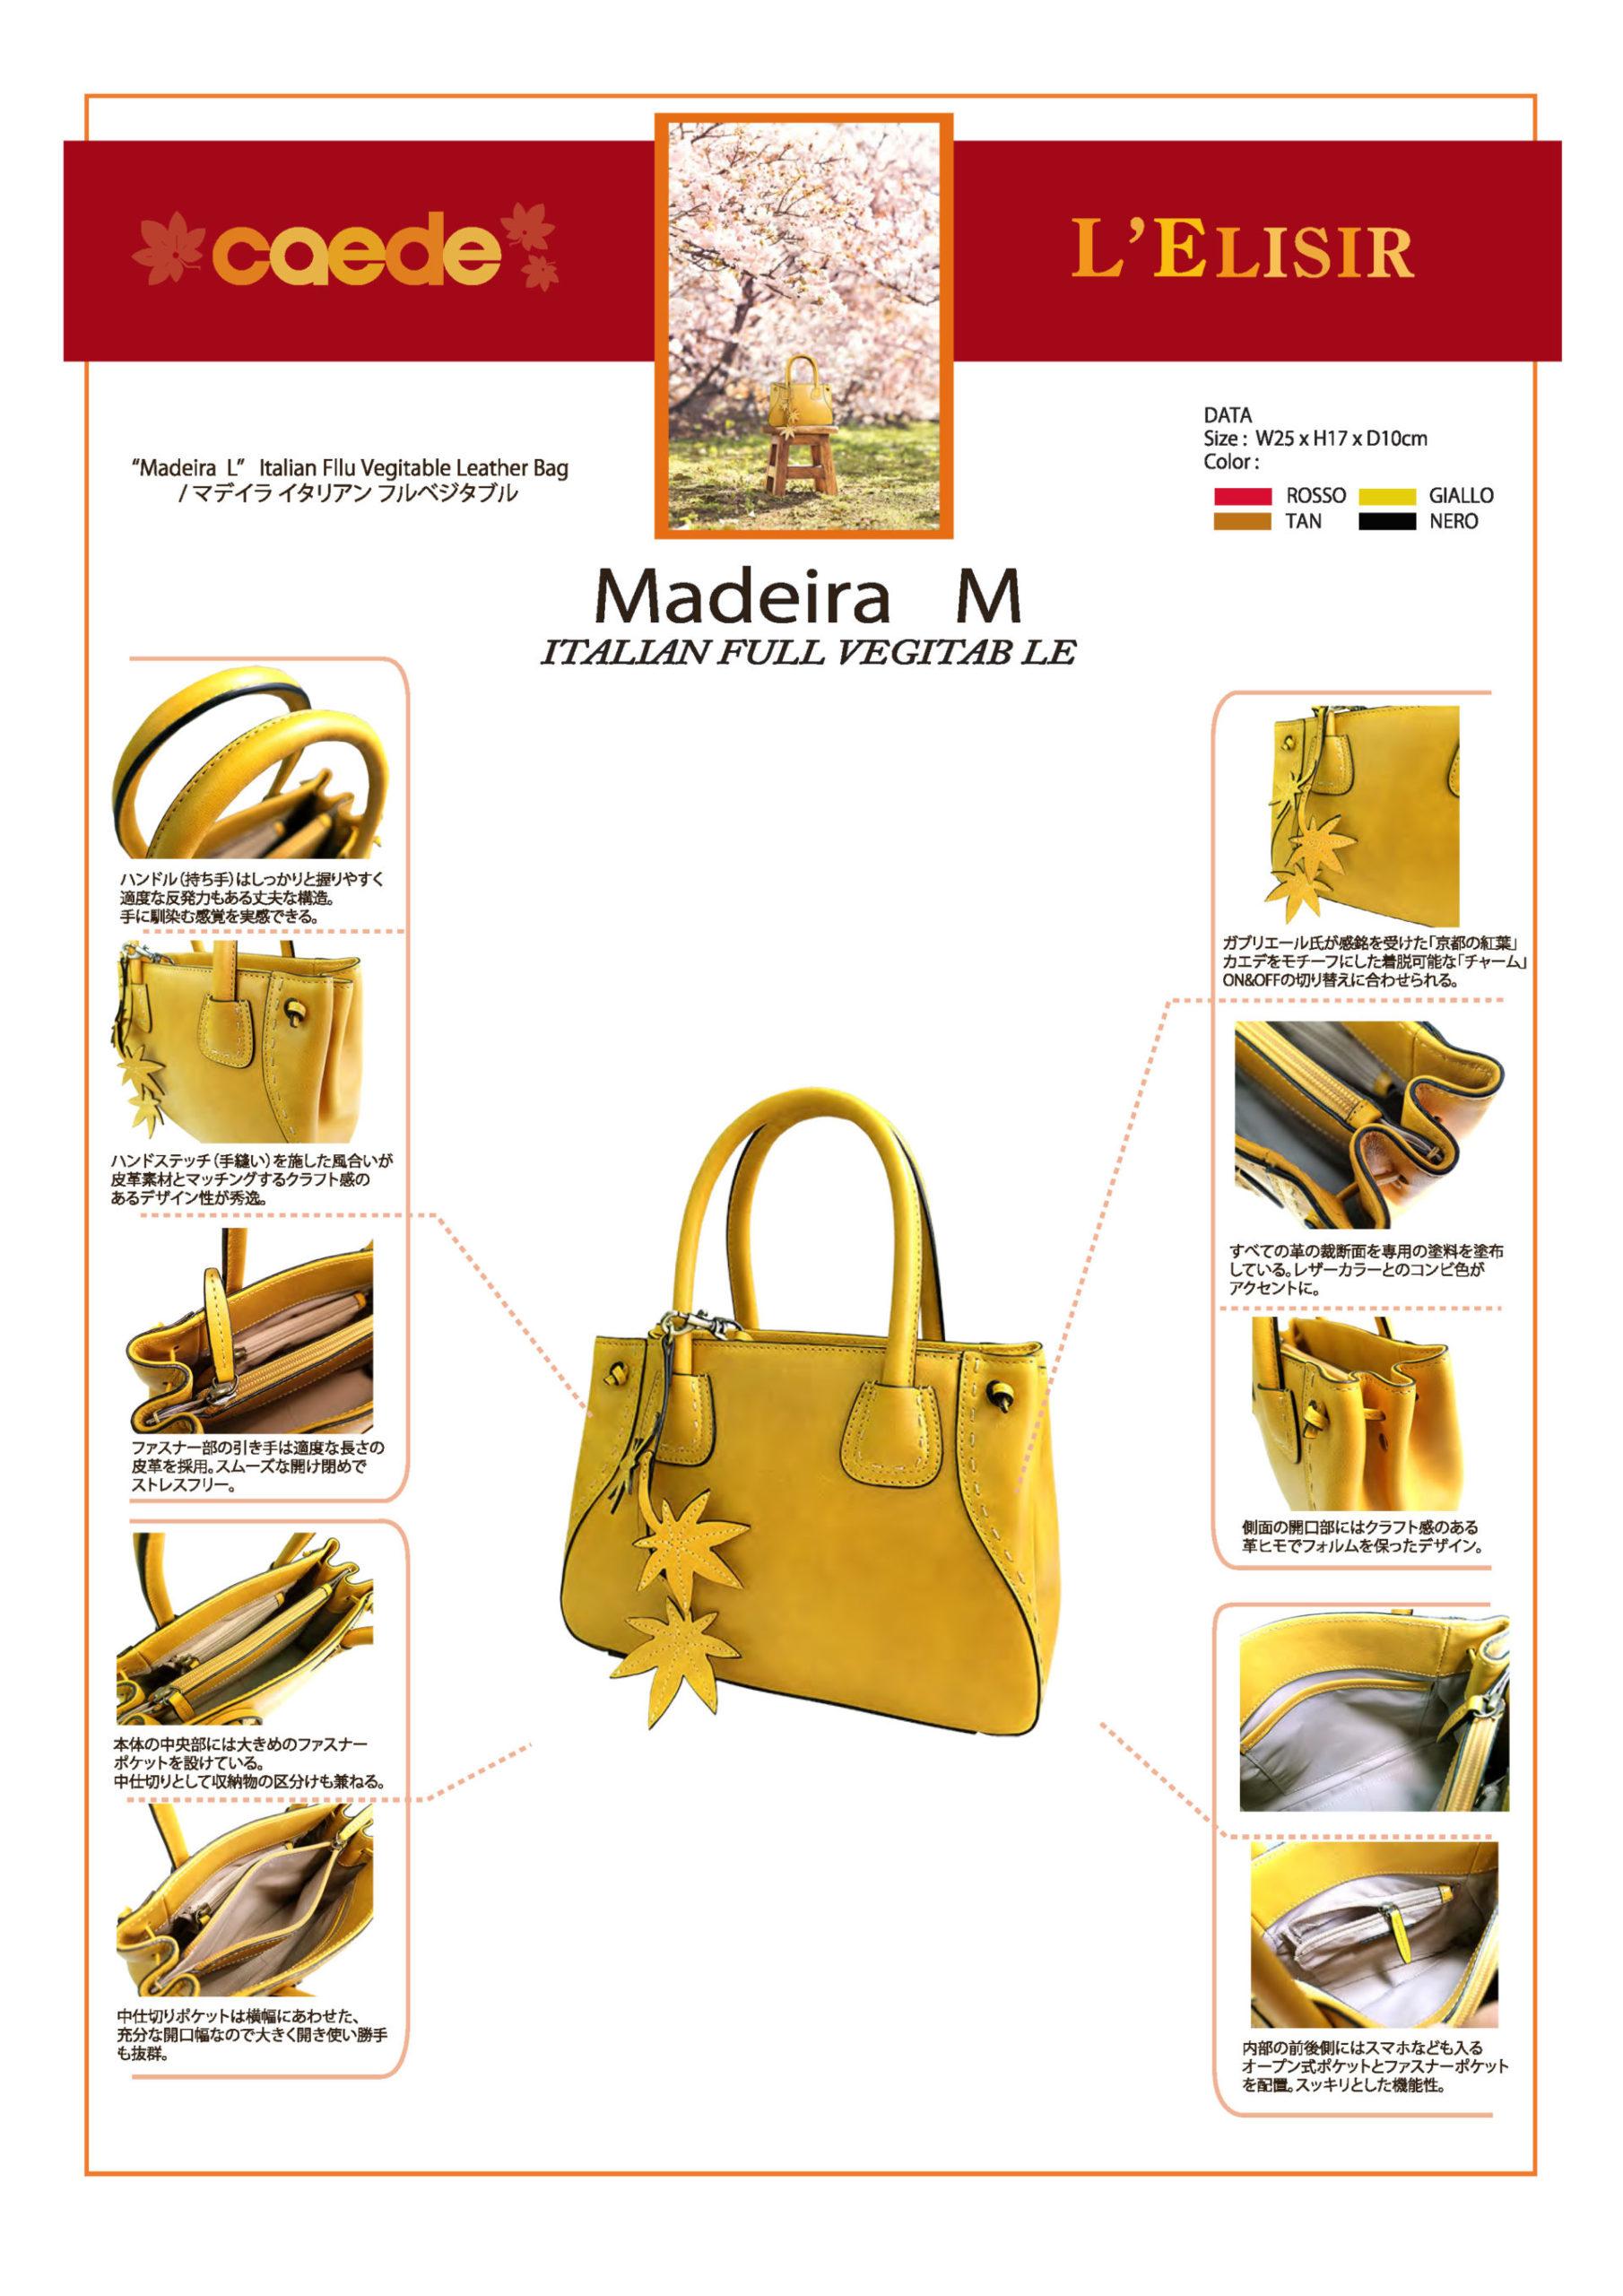 Madeira M